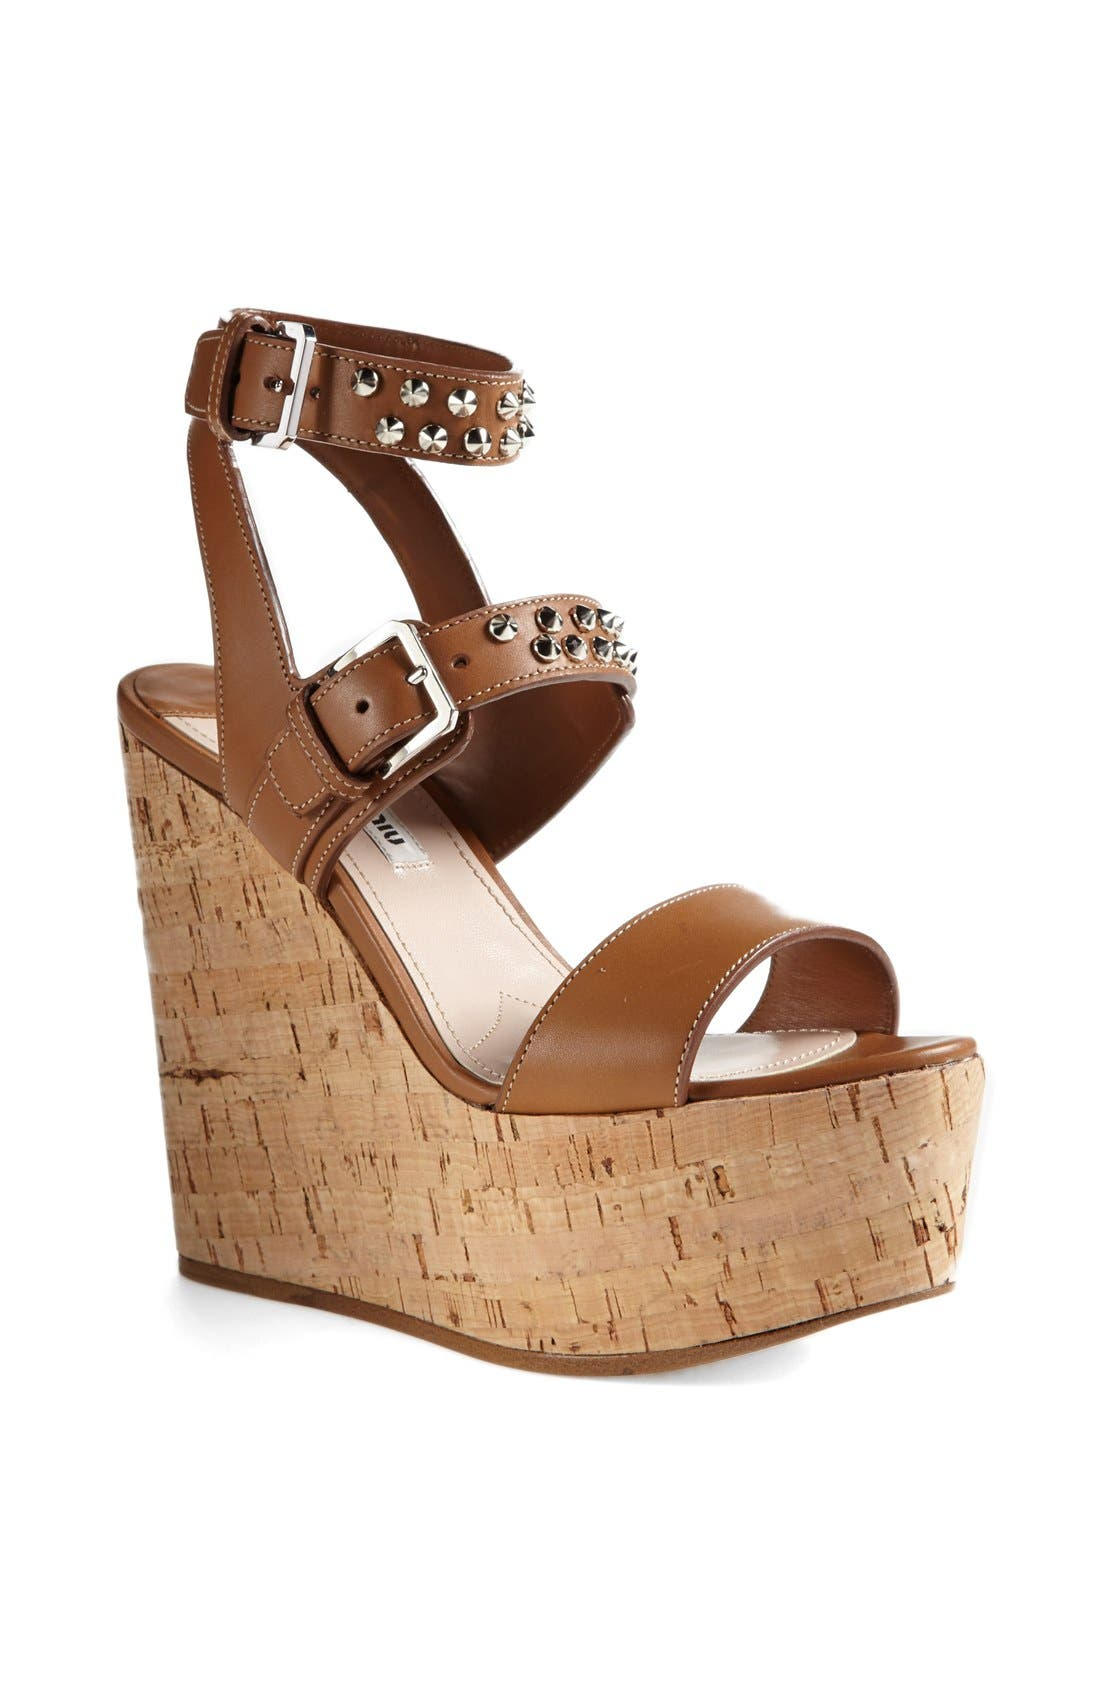 Alternate Image 1 Selected - Miu Miu Studded Wedge Sandal